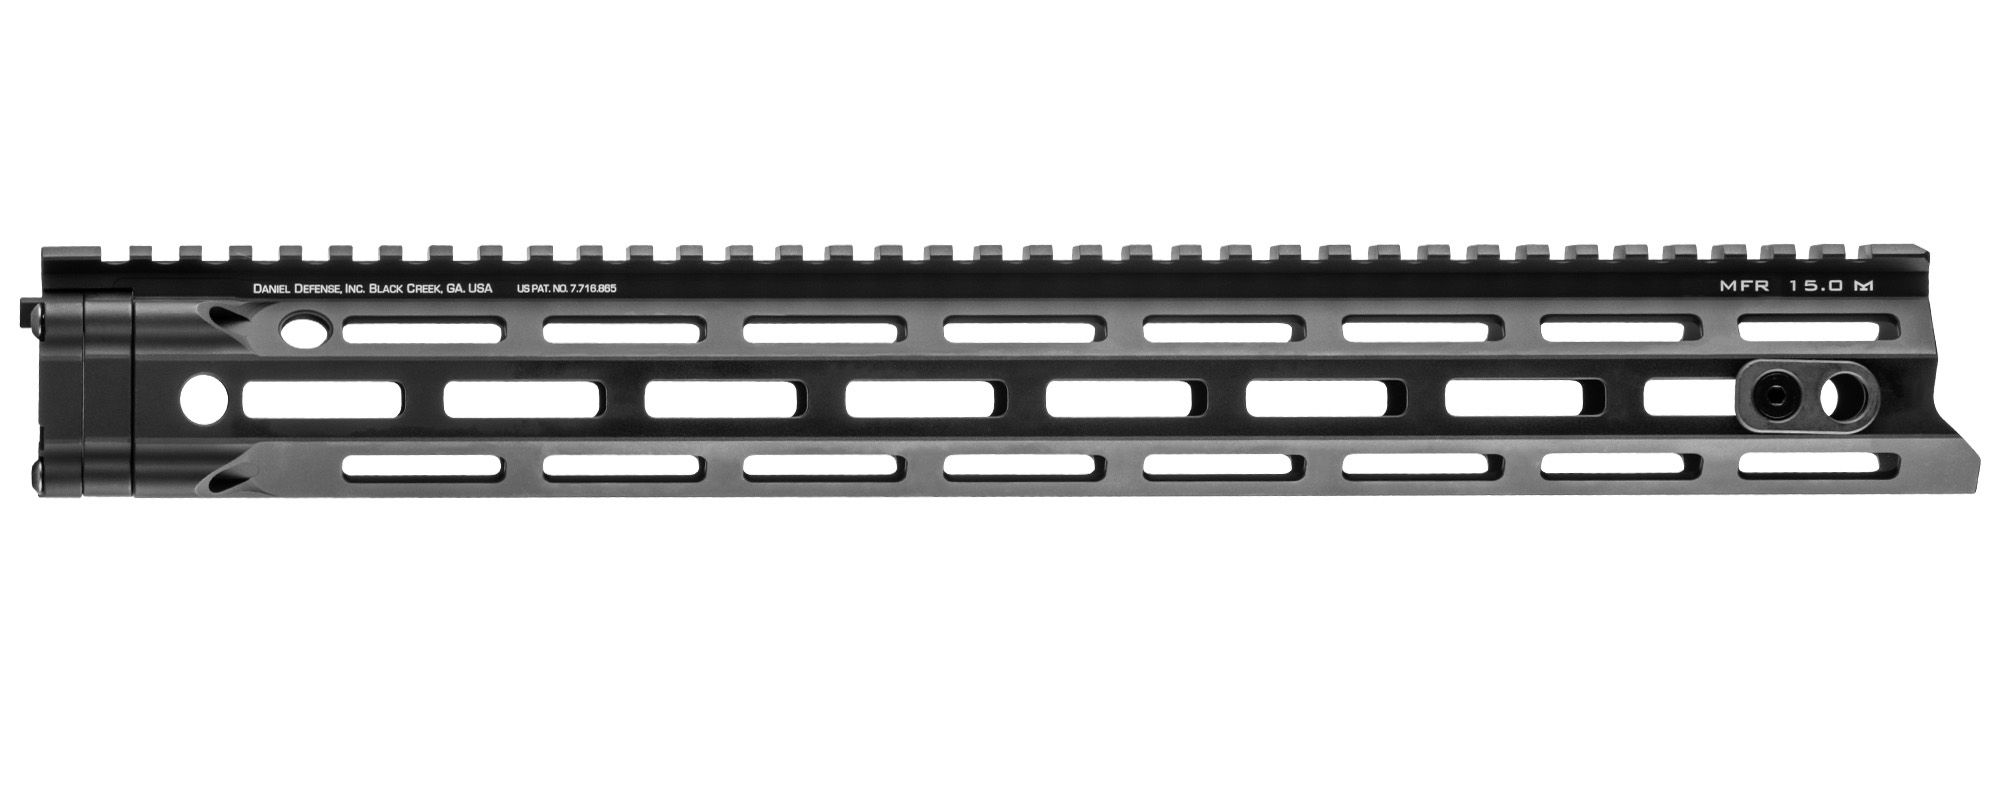 Daniel Defense MFR 15.0 Rail - Black